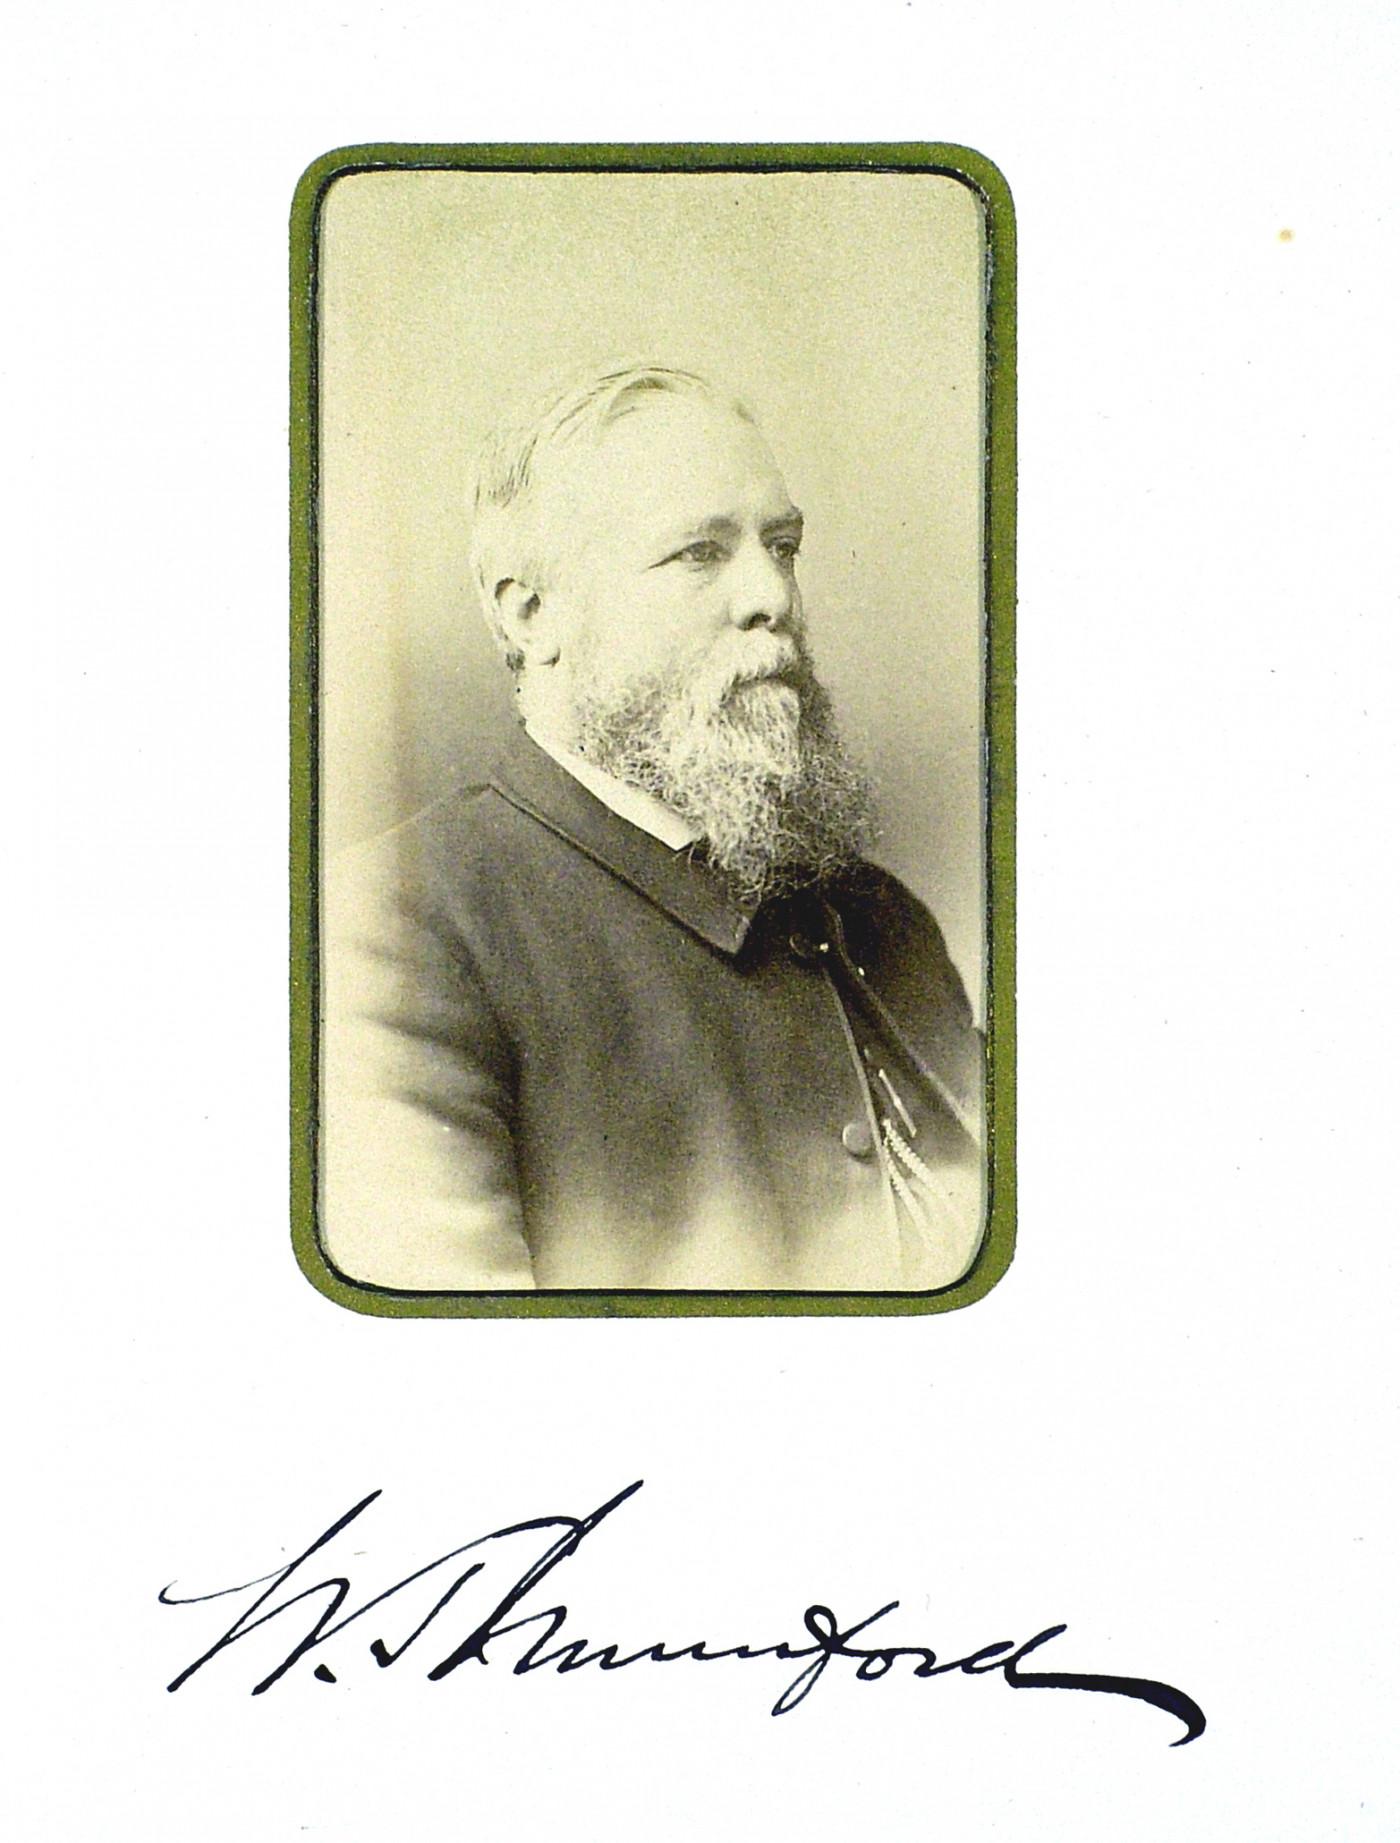 William Mumford BW address